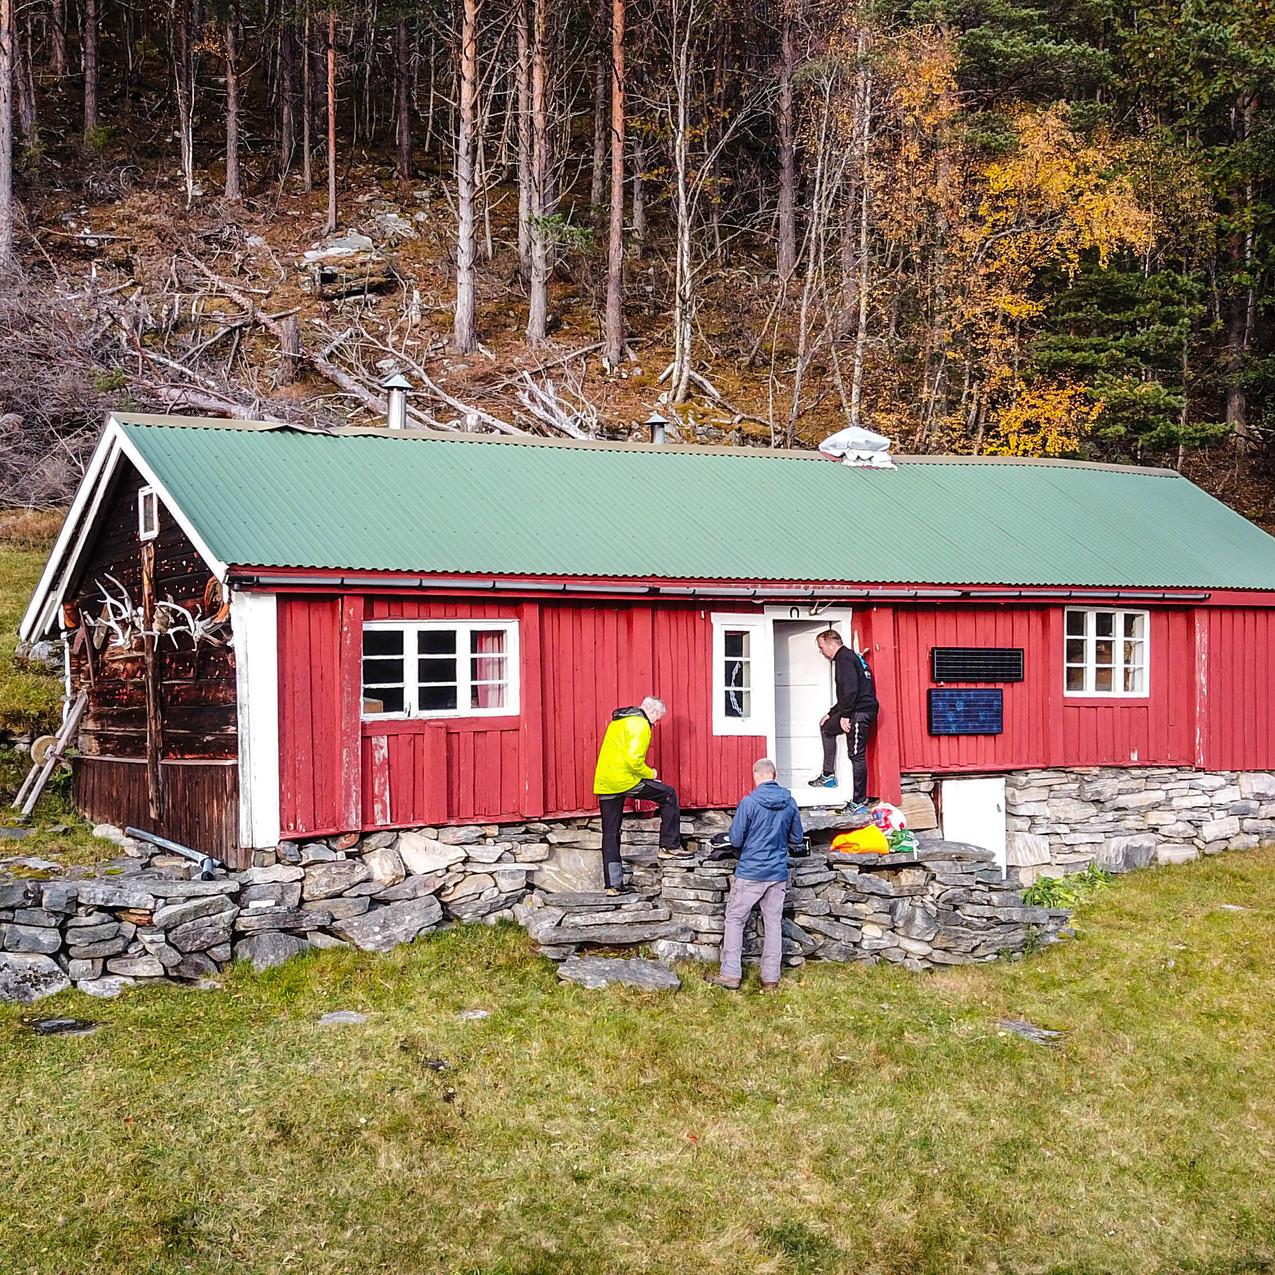 Djupedalen med Storfjordens Venner 19 okt 2017 DJI_0001-1